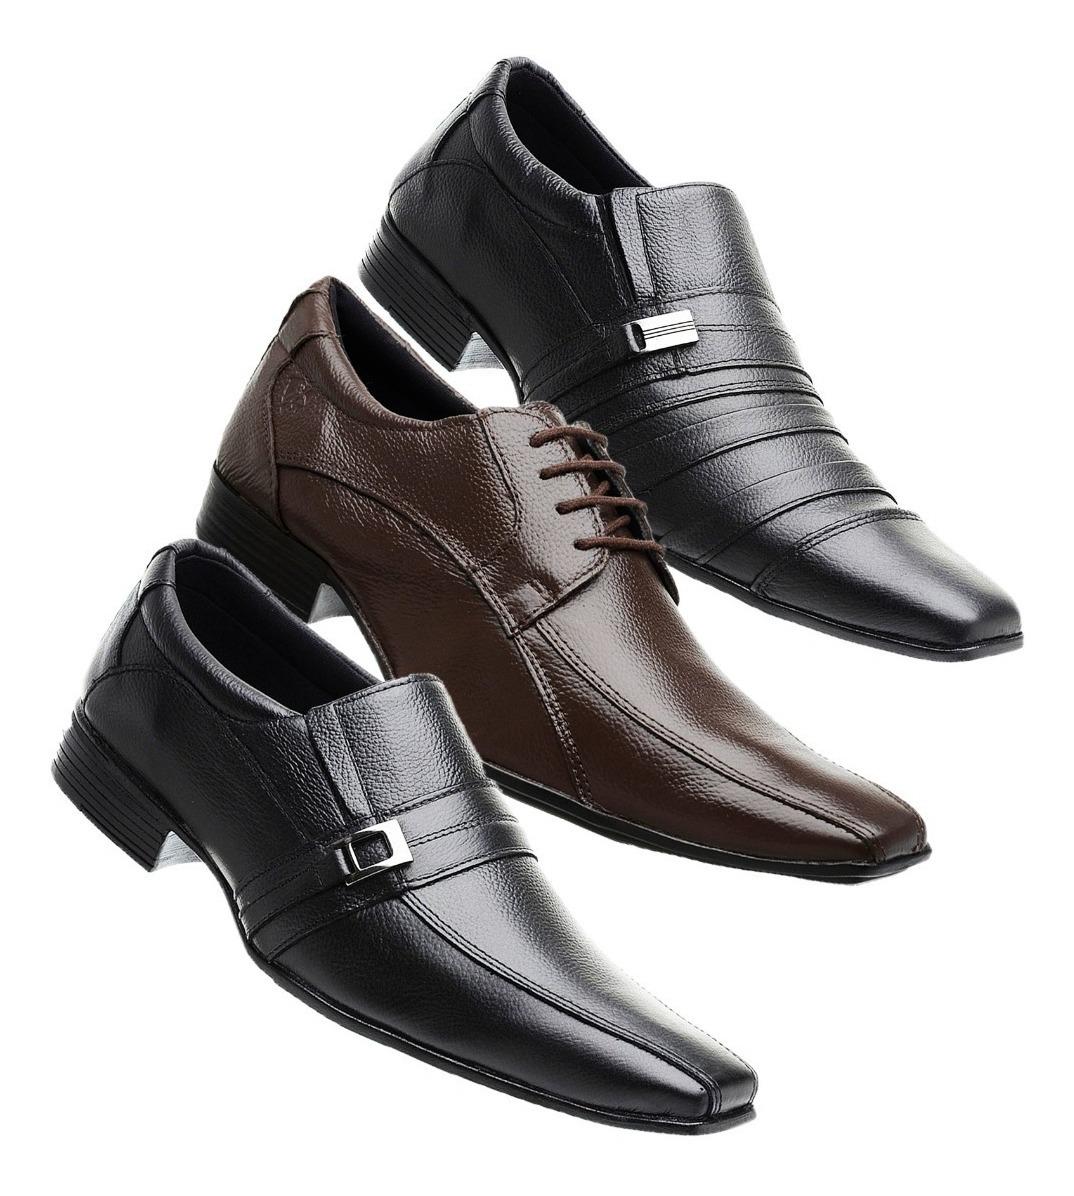 feb926545 kit 3 pares sapato masculino couro frete grátis ath c l. Carregando zoom.